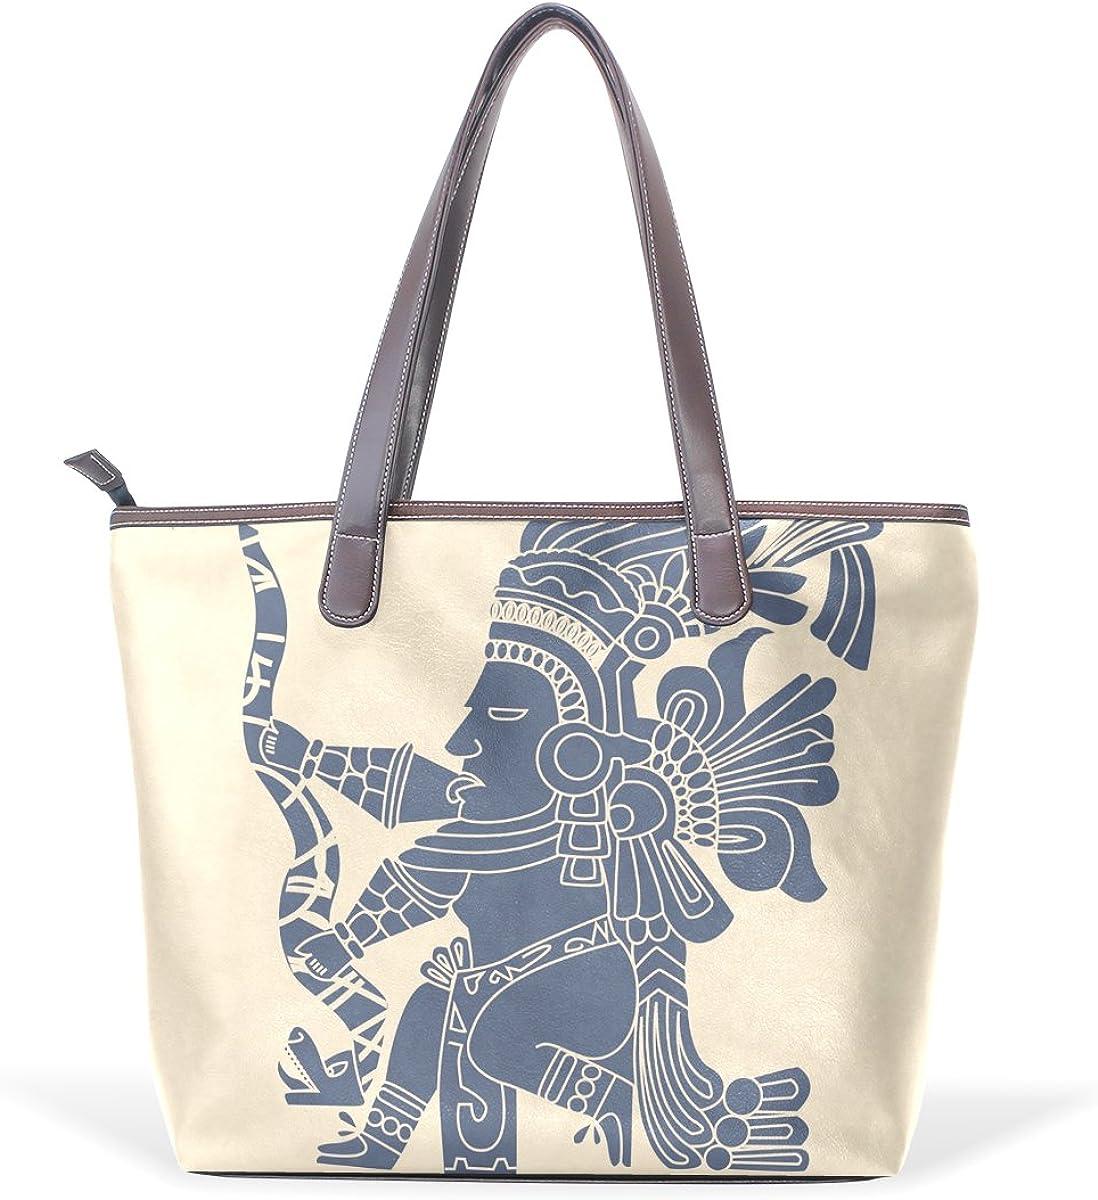 Native American Indian Art Prints Womens Fashion Large Tote Ladies Handbag Shoulder Bag